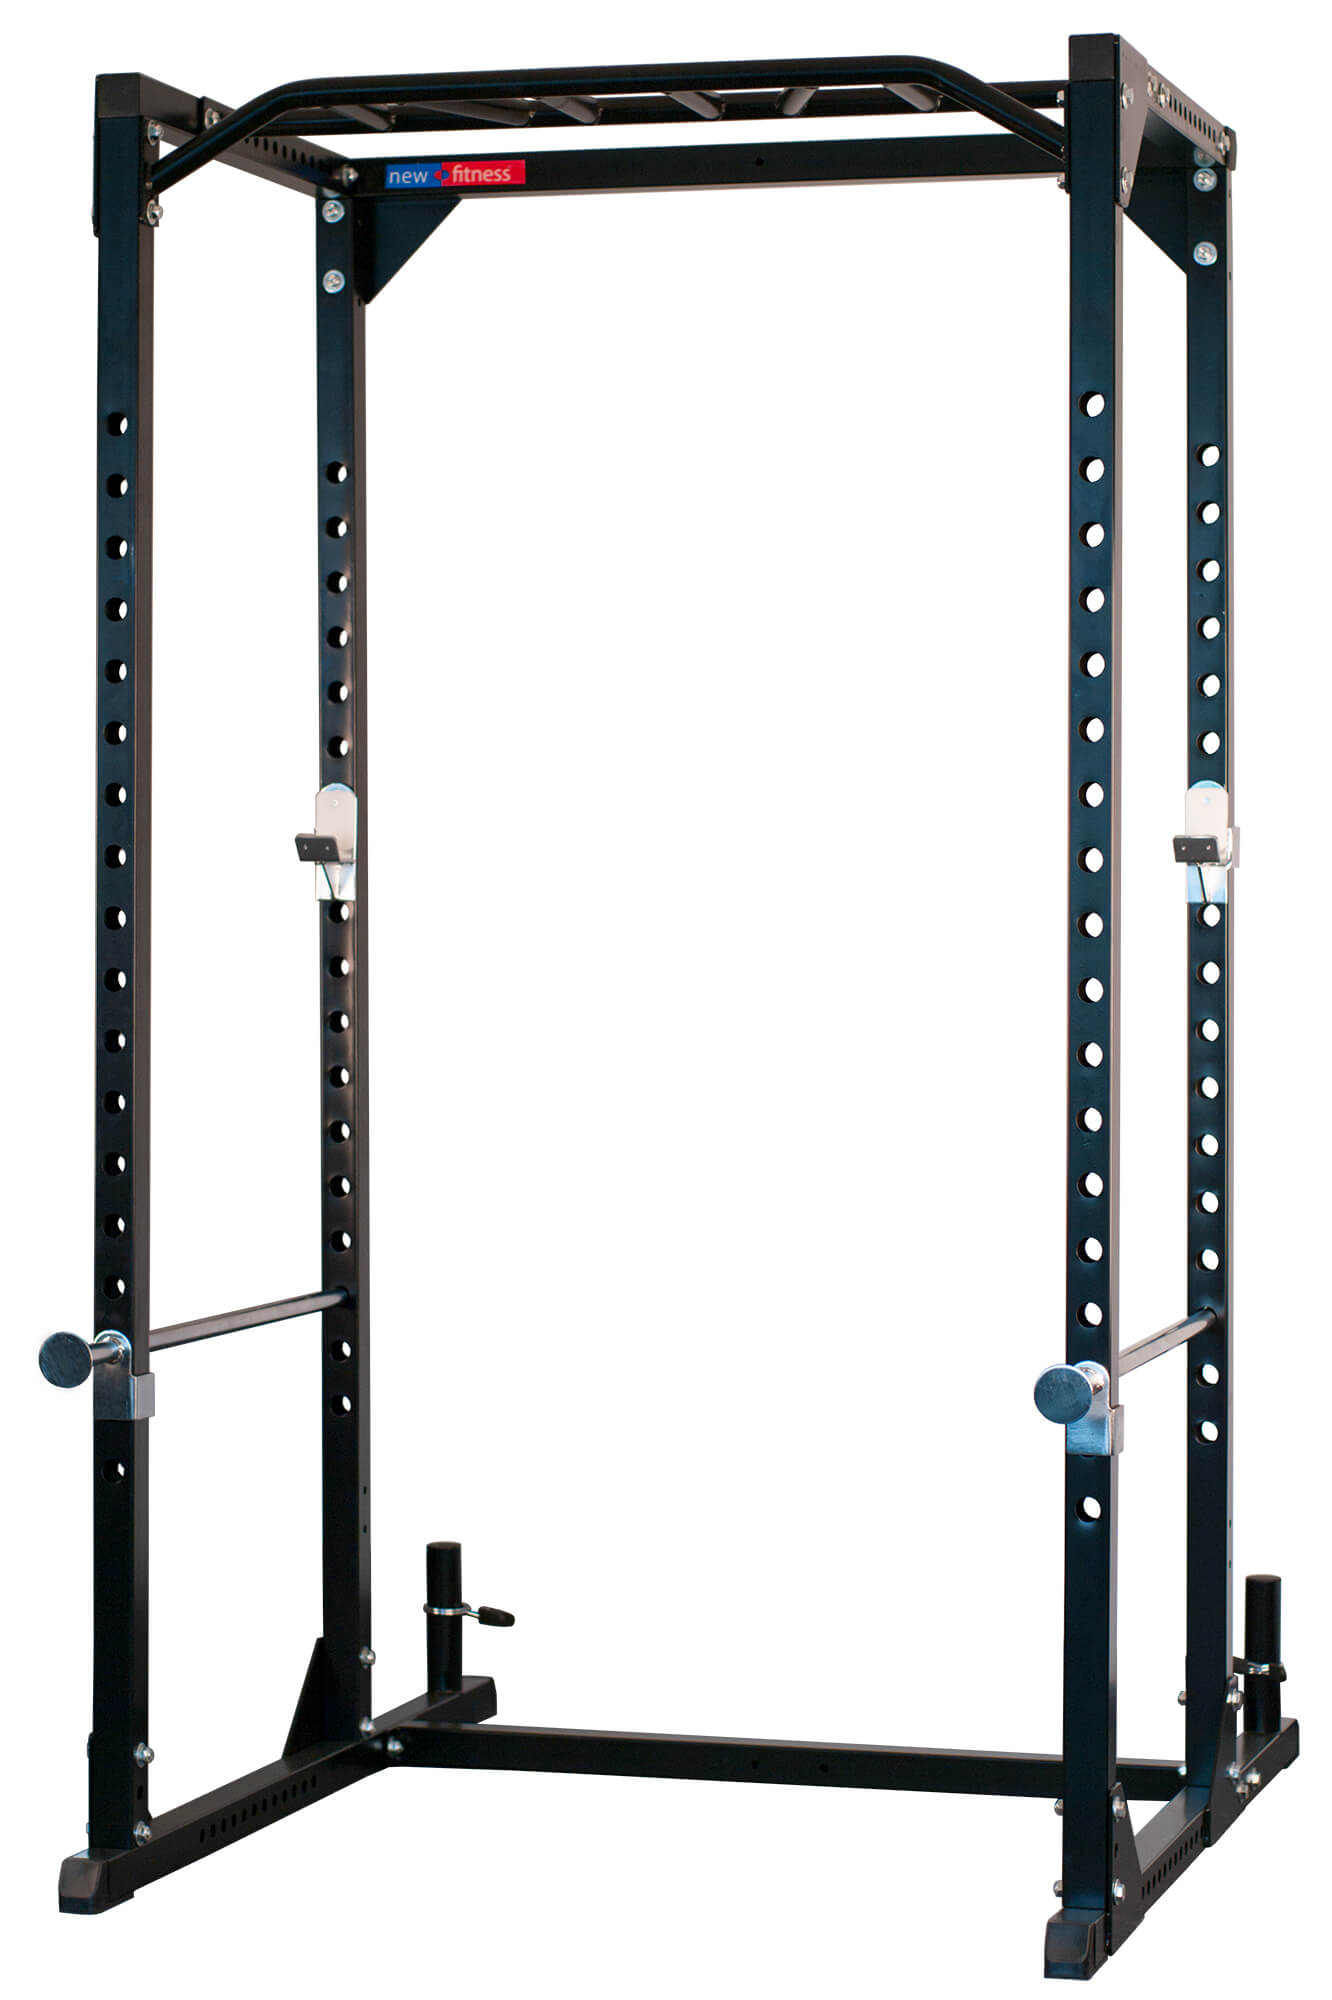 Functional Power Rack newfitness® NE770 günstig bei simple products ...